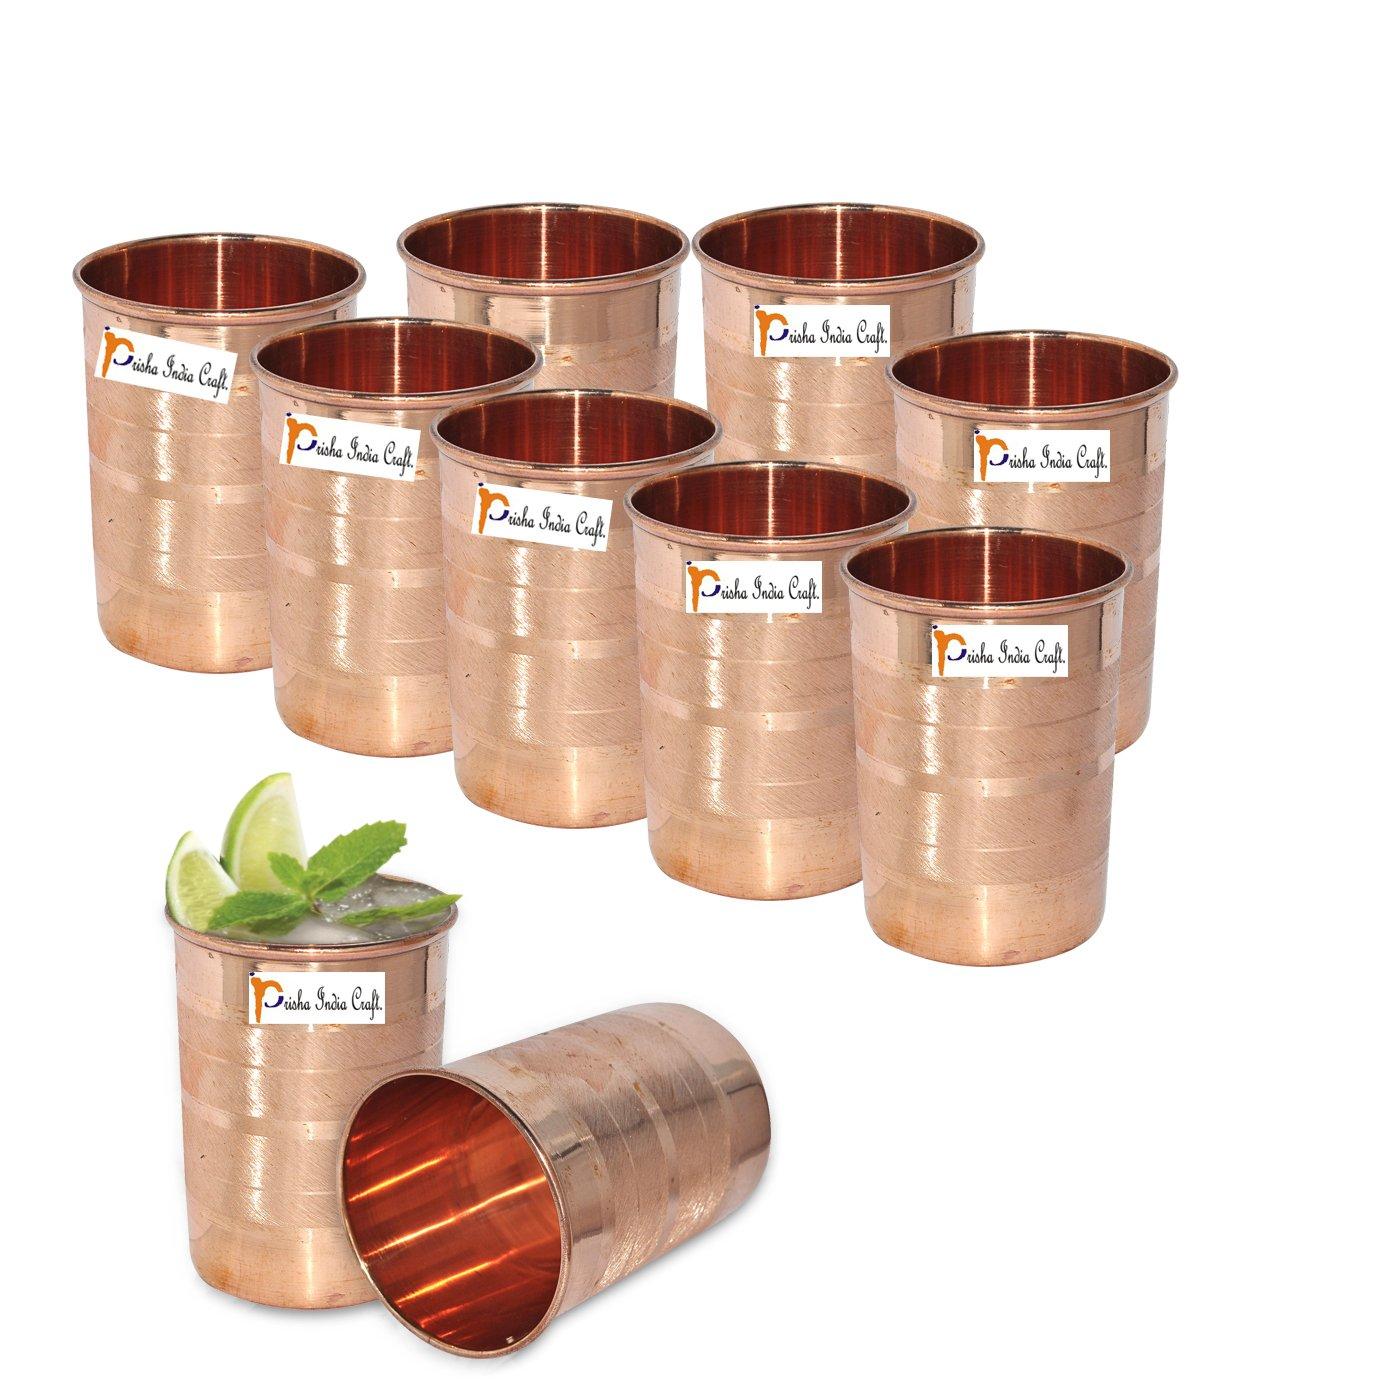 Set Of 10 - Prisha India Craft  Copper Cup Water Tumbler - Handmade Water Glasses - Traveler's Copper Mug For Ayurveda Benefits - Christmas Gift Item